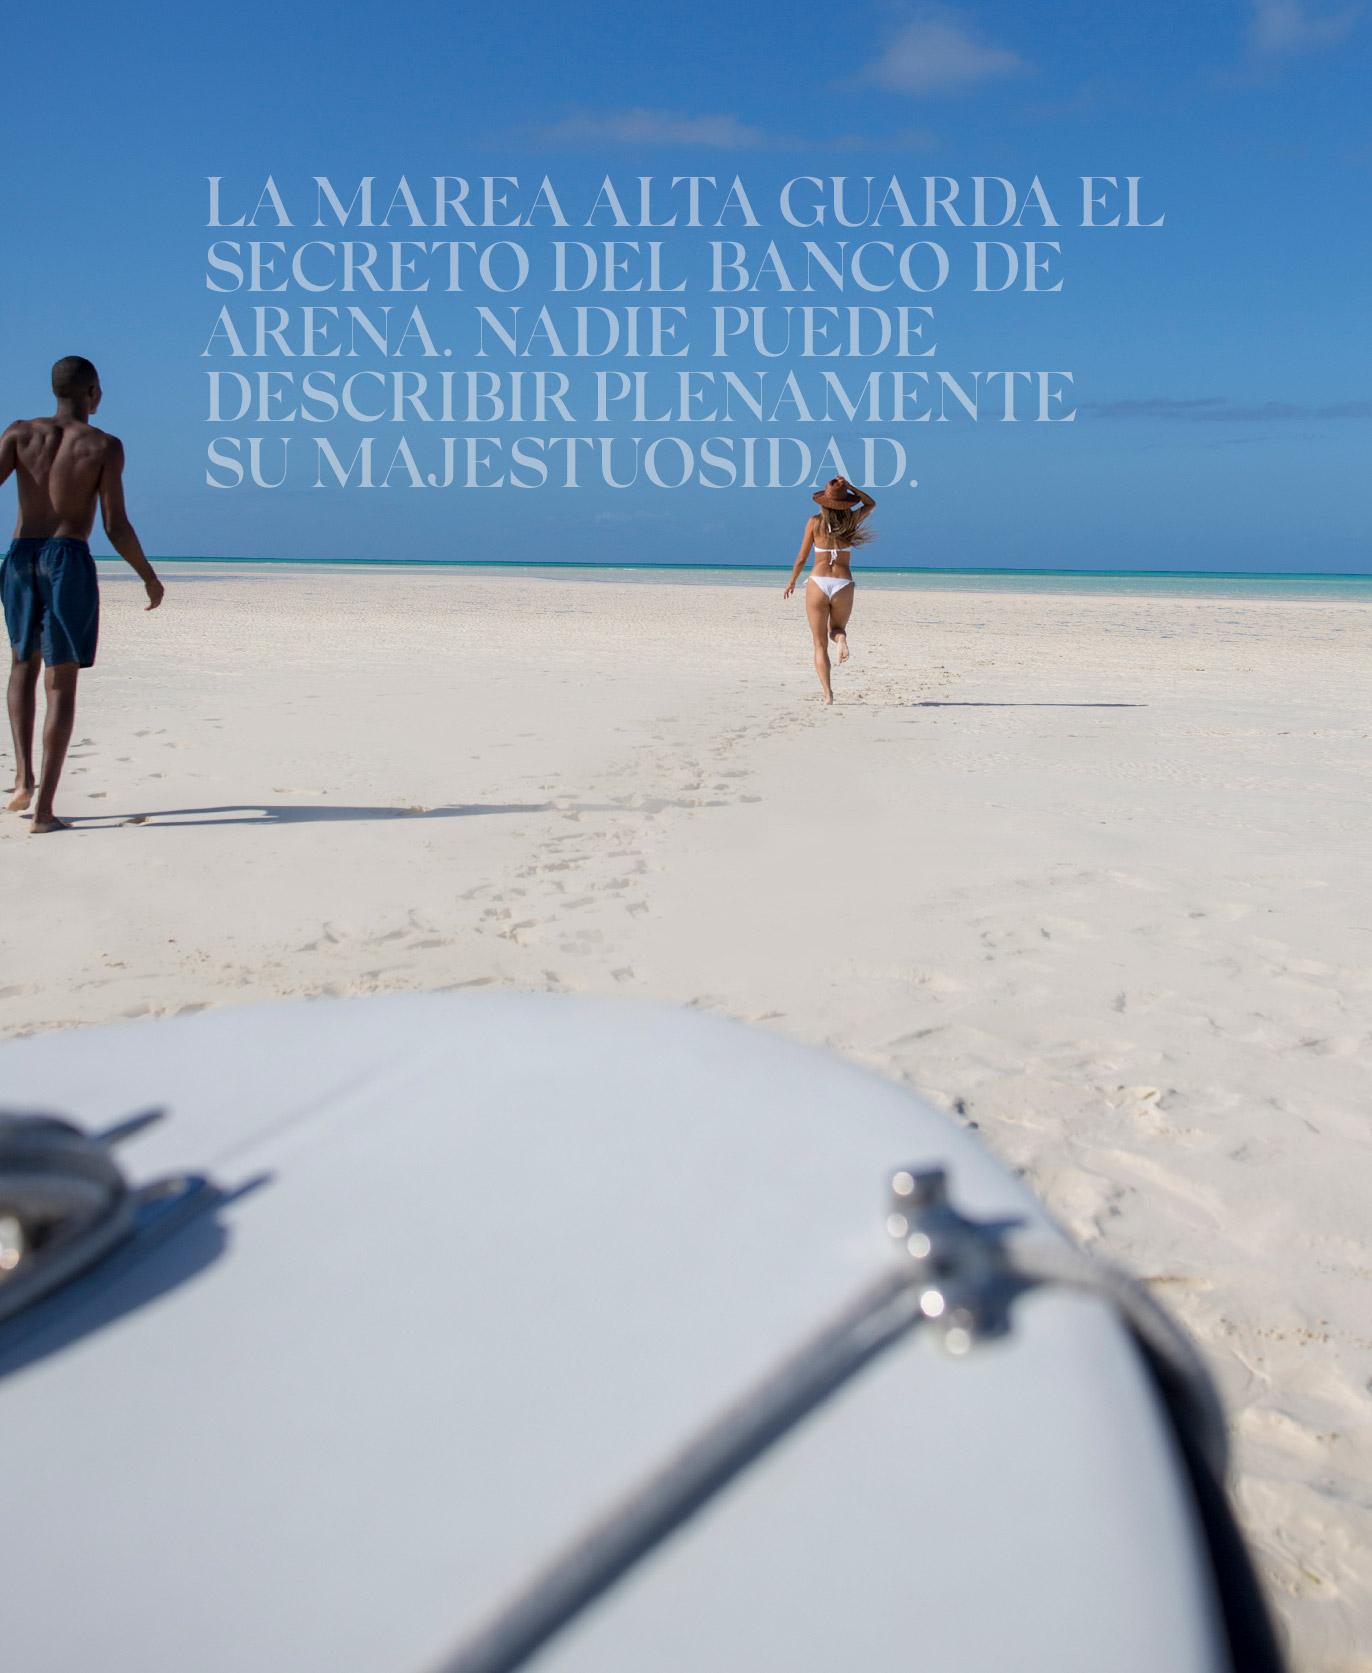 Couples running on a sandbar